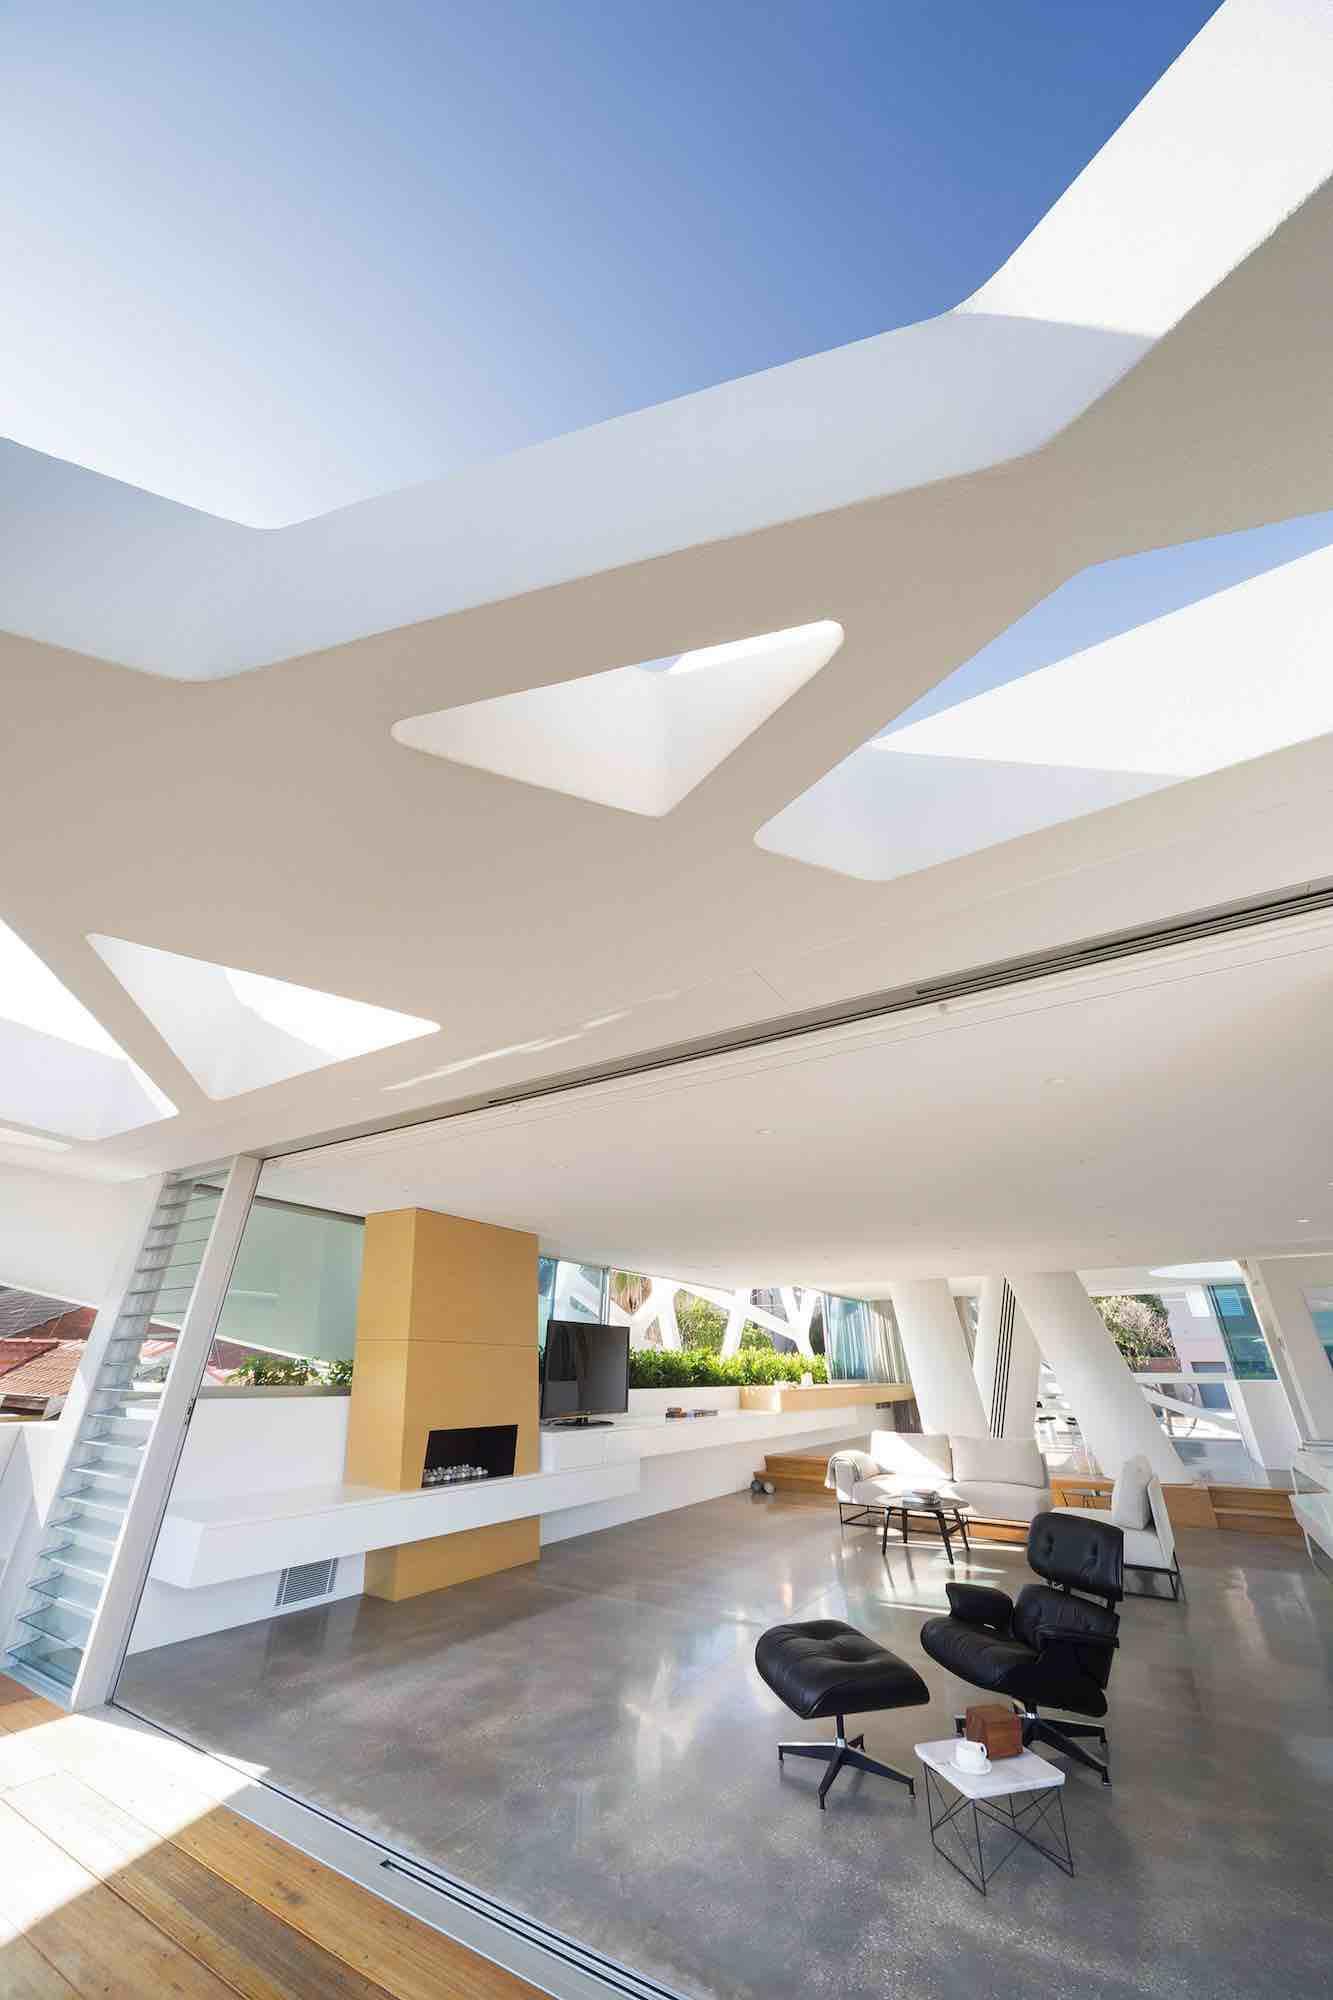 hewlett-street-house-mpr-design-group_hewlett_house14